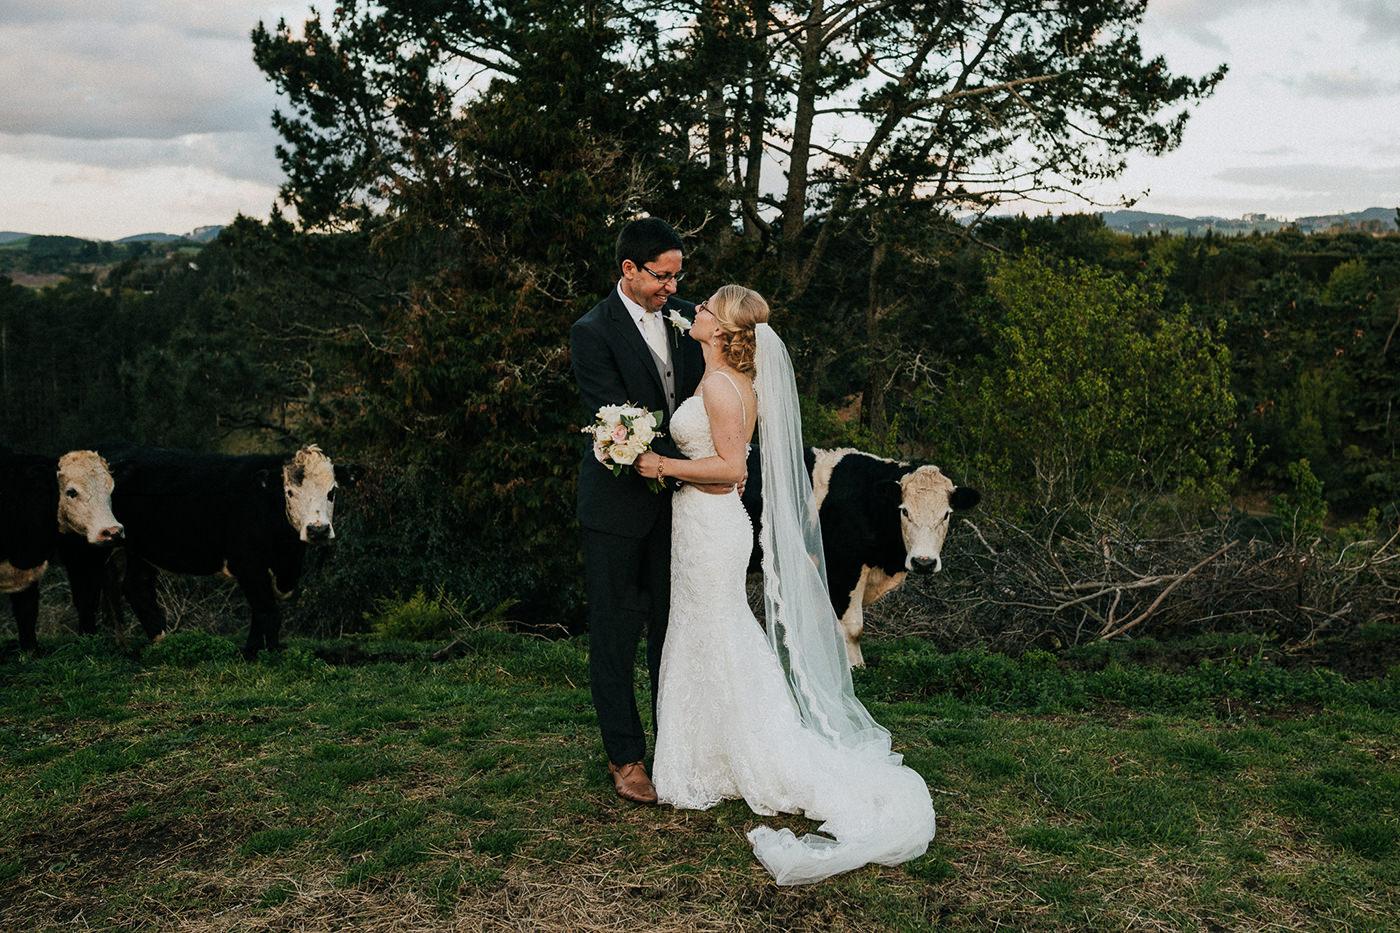 wedding_photographer_nz-00067.jpg